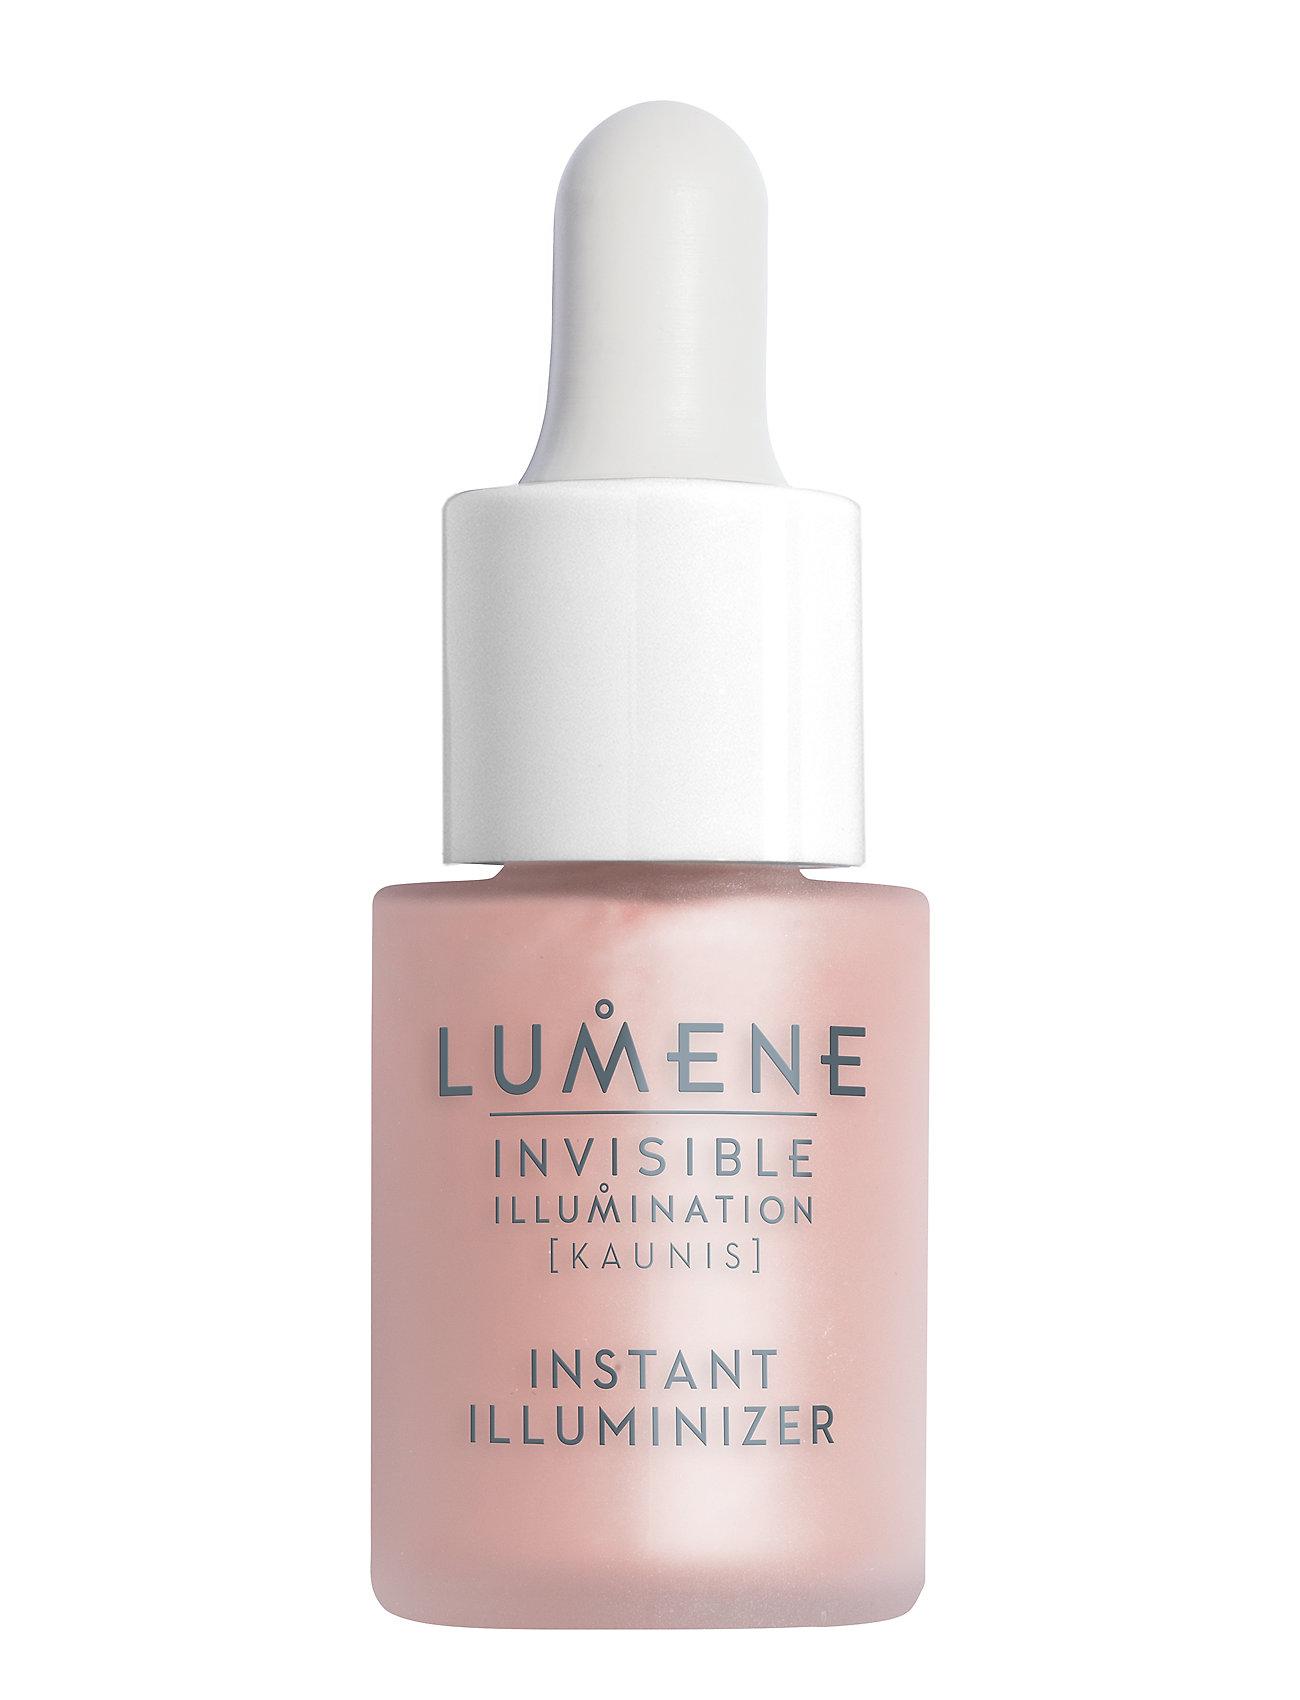 Image of Invisible Illumination Instant Illuminizer Highlighter Makeup LUMENE (3308420017)